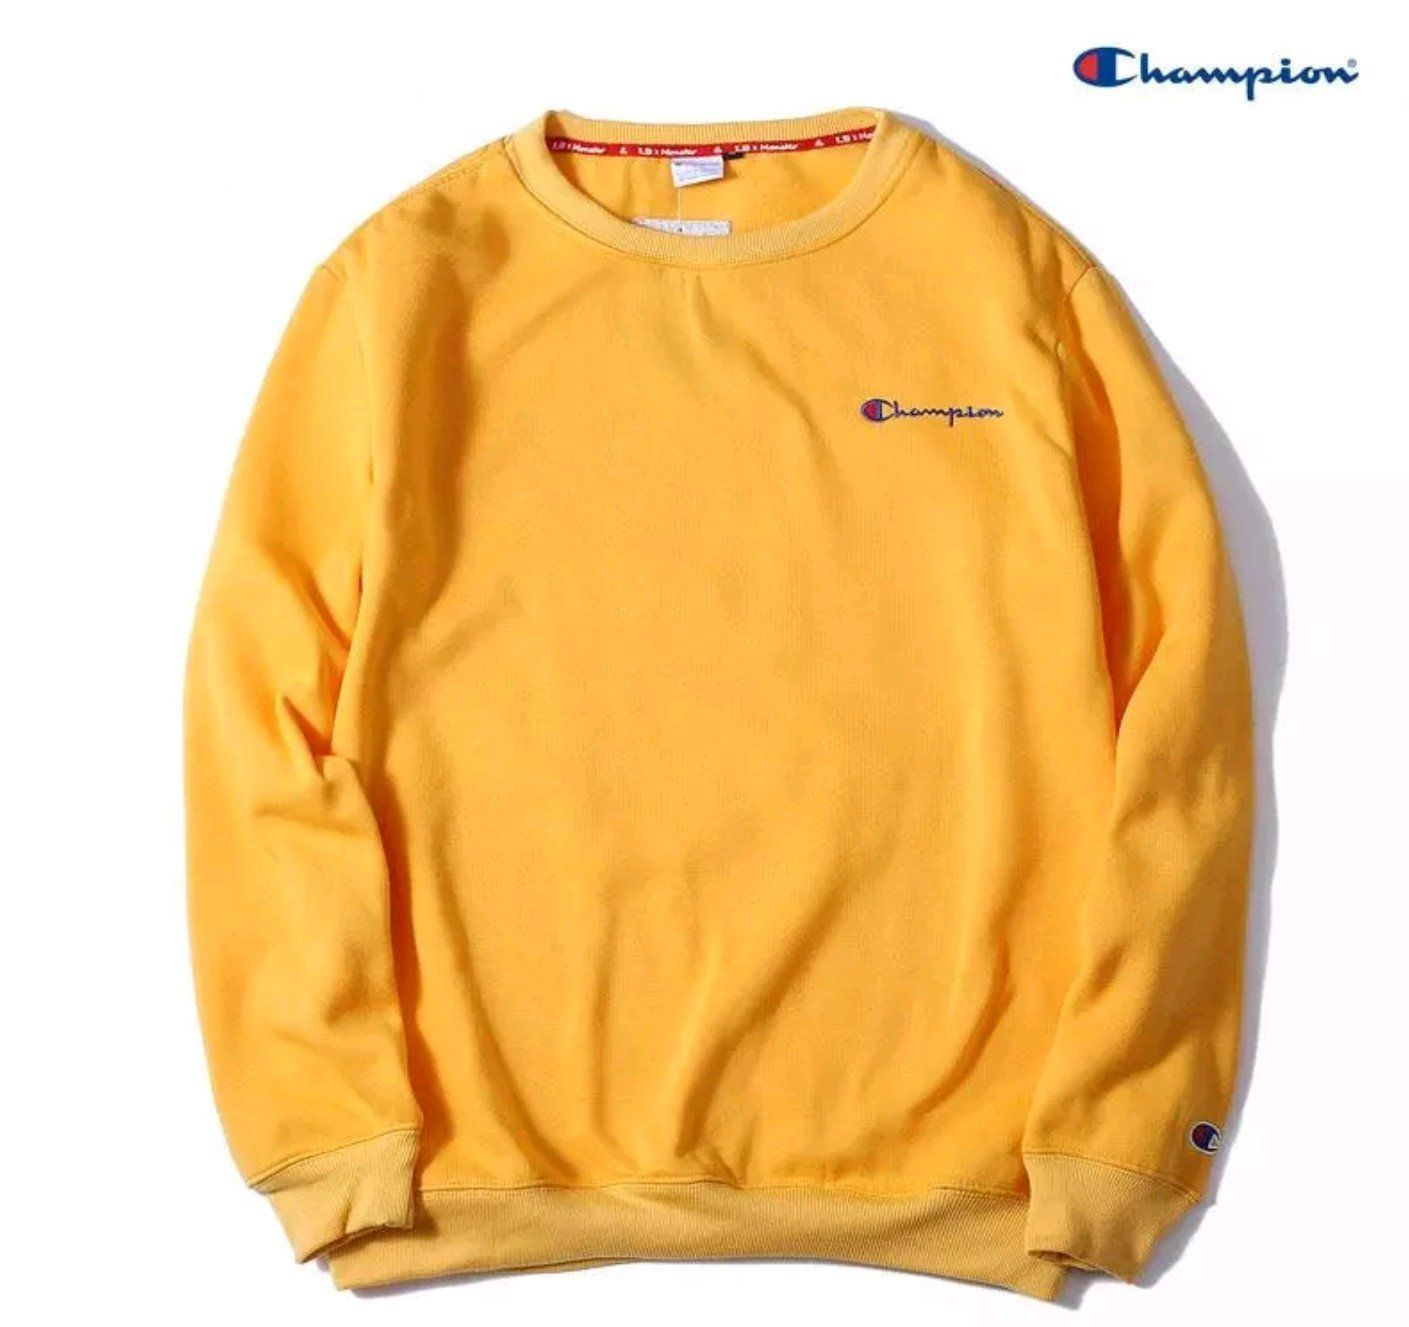 Champion Sweatshirt Yellow Sweatshirt Champion Sweatshirt Collar Sweater [ 1327 x 1409 Pixel ]